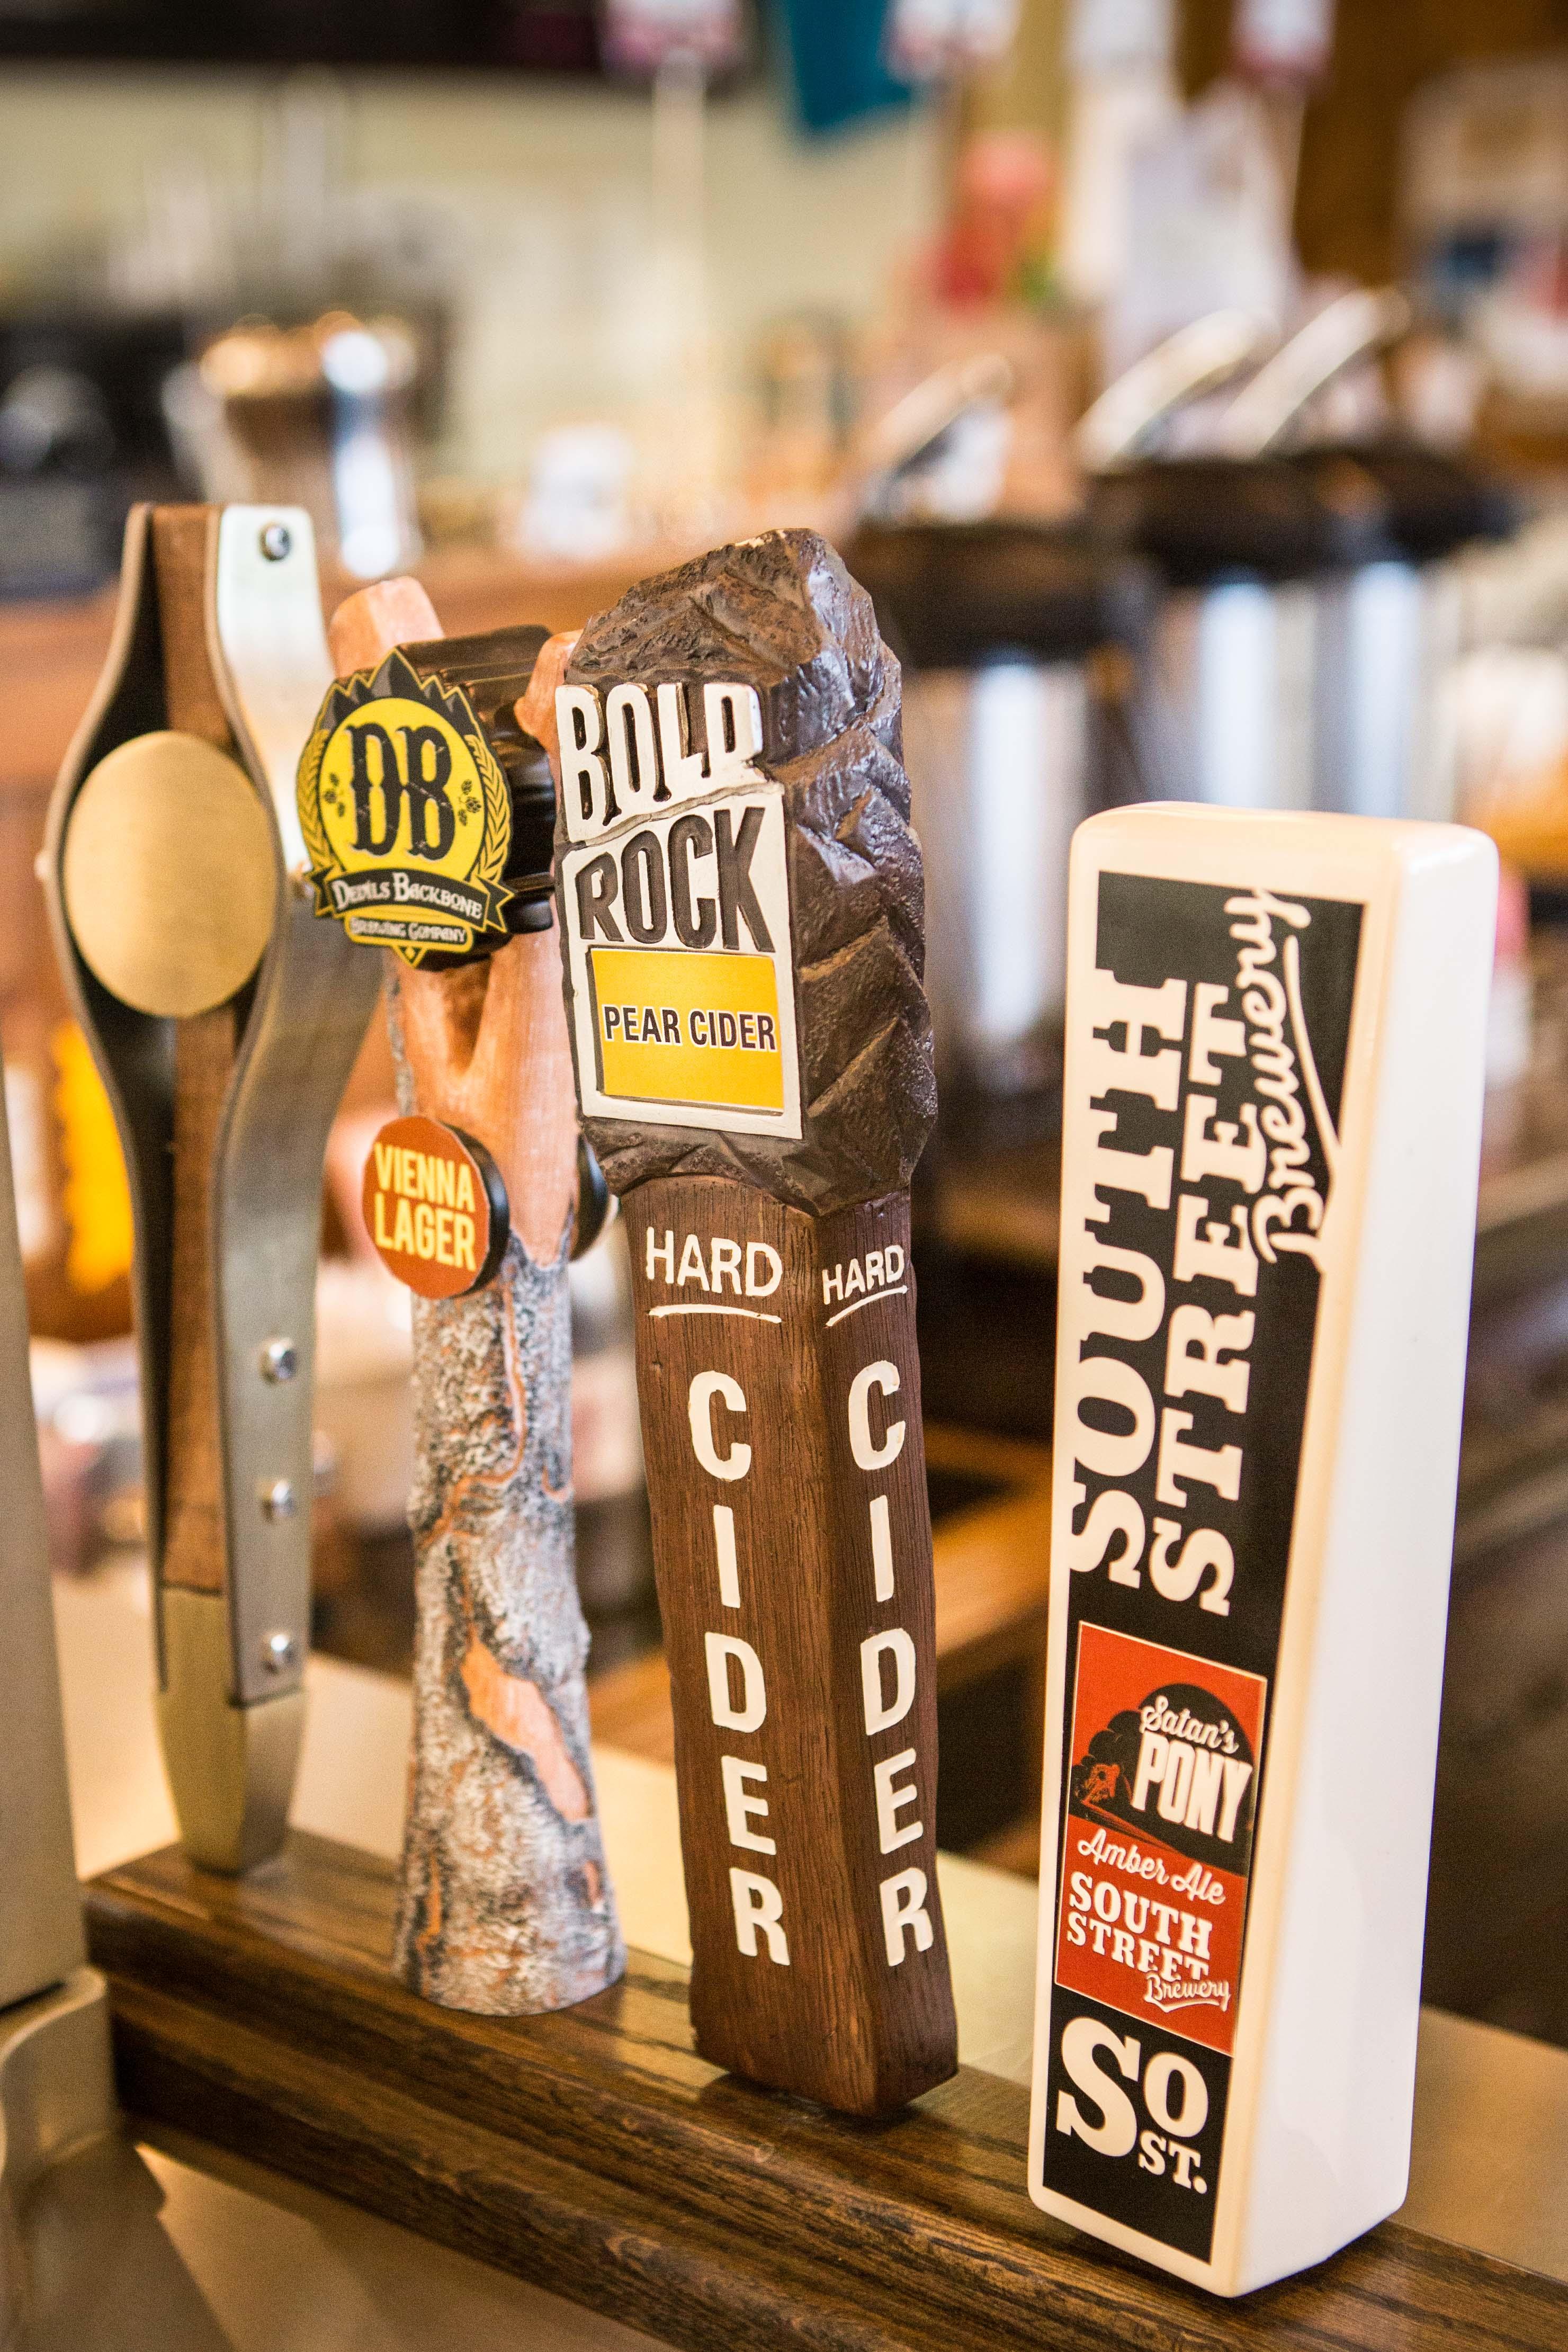 Craft beer on tap, Staunton, VA